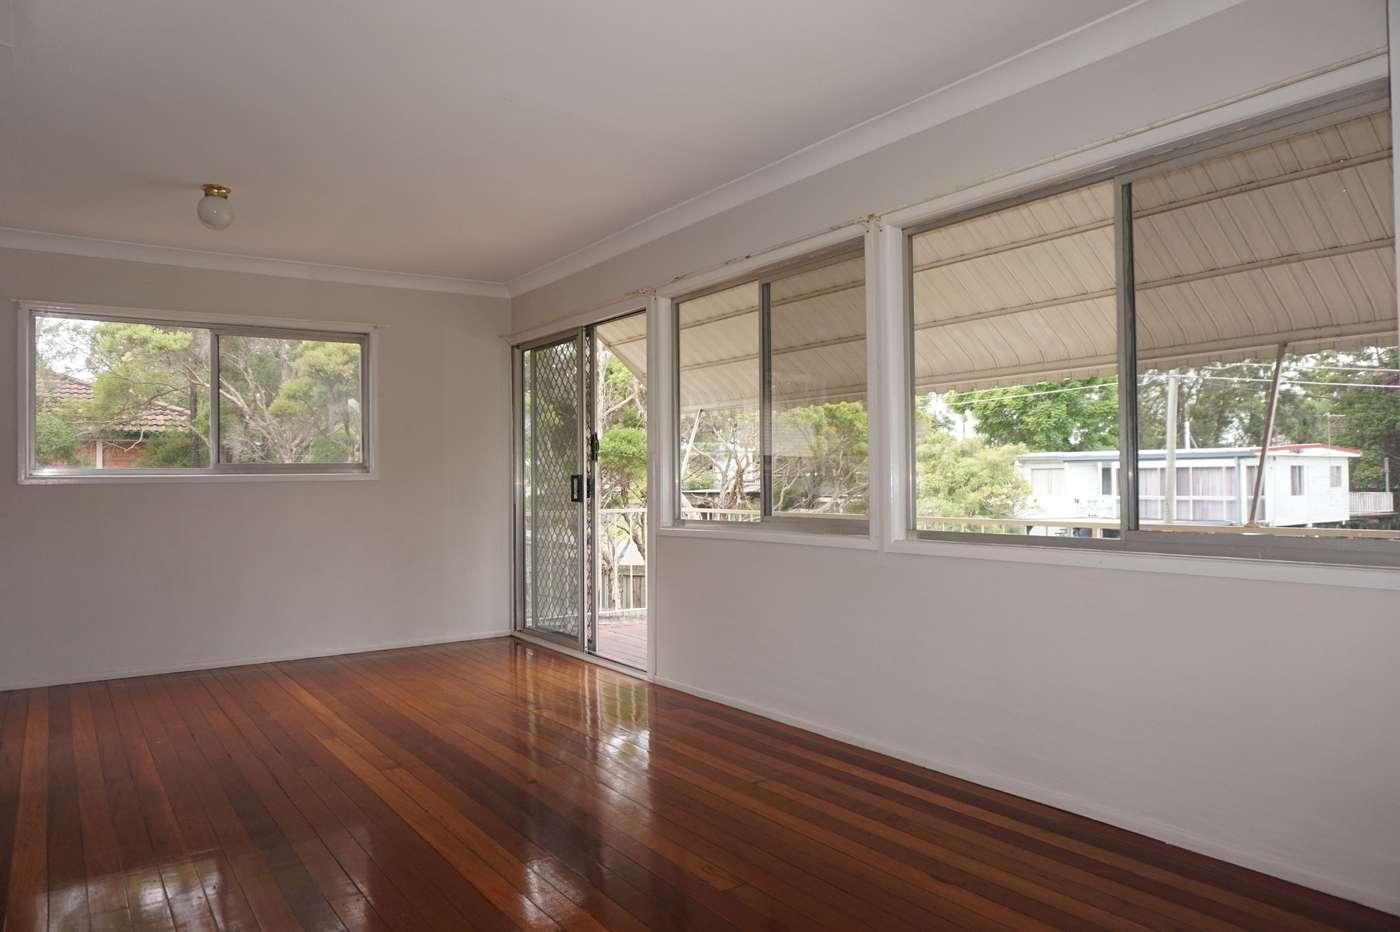 Main view of Homely house listing, 6 Rowanda Street, Slacks Creek, QLD 4127